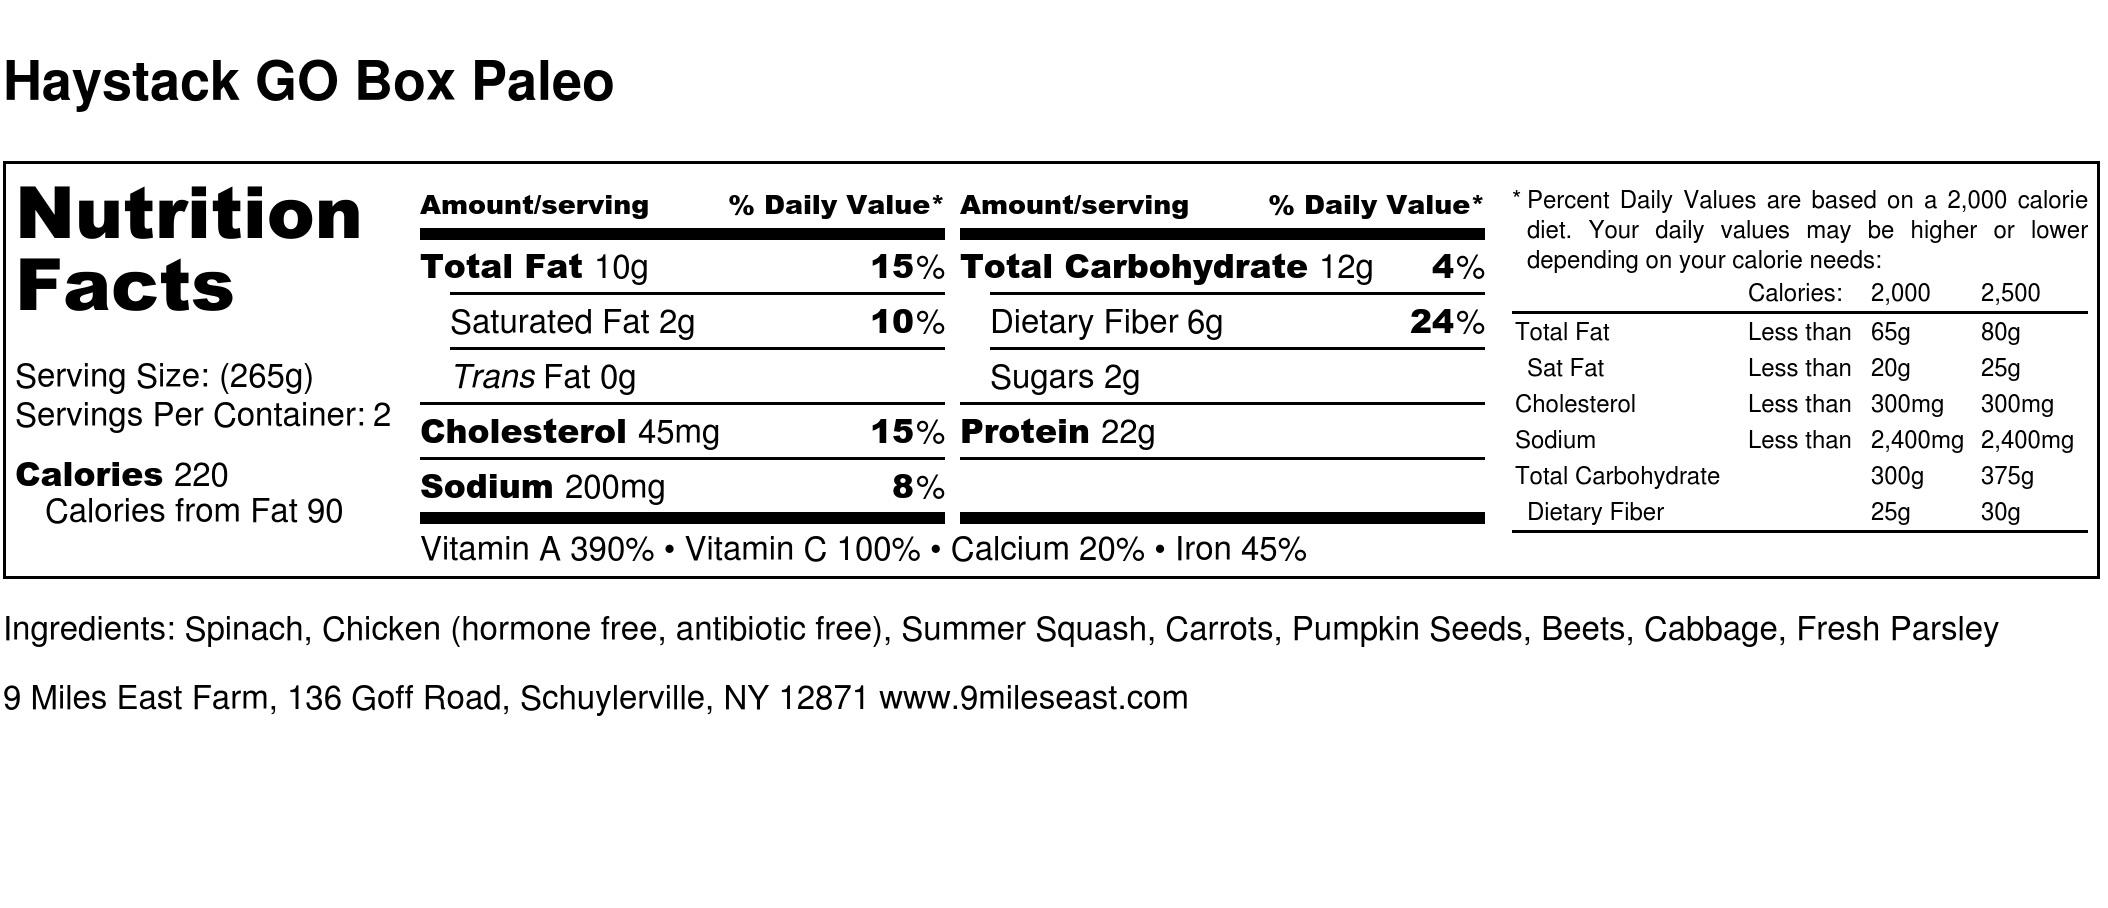 Haystack GO Box Paleo - Nutrition Label.jpg